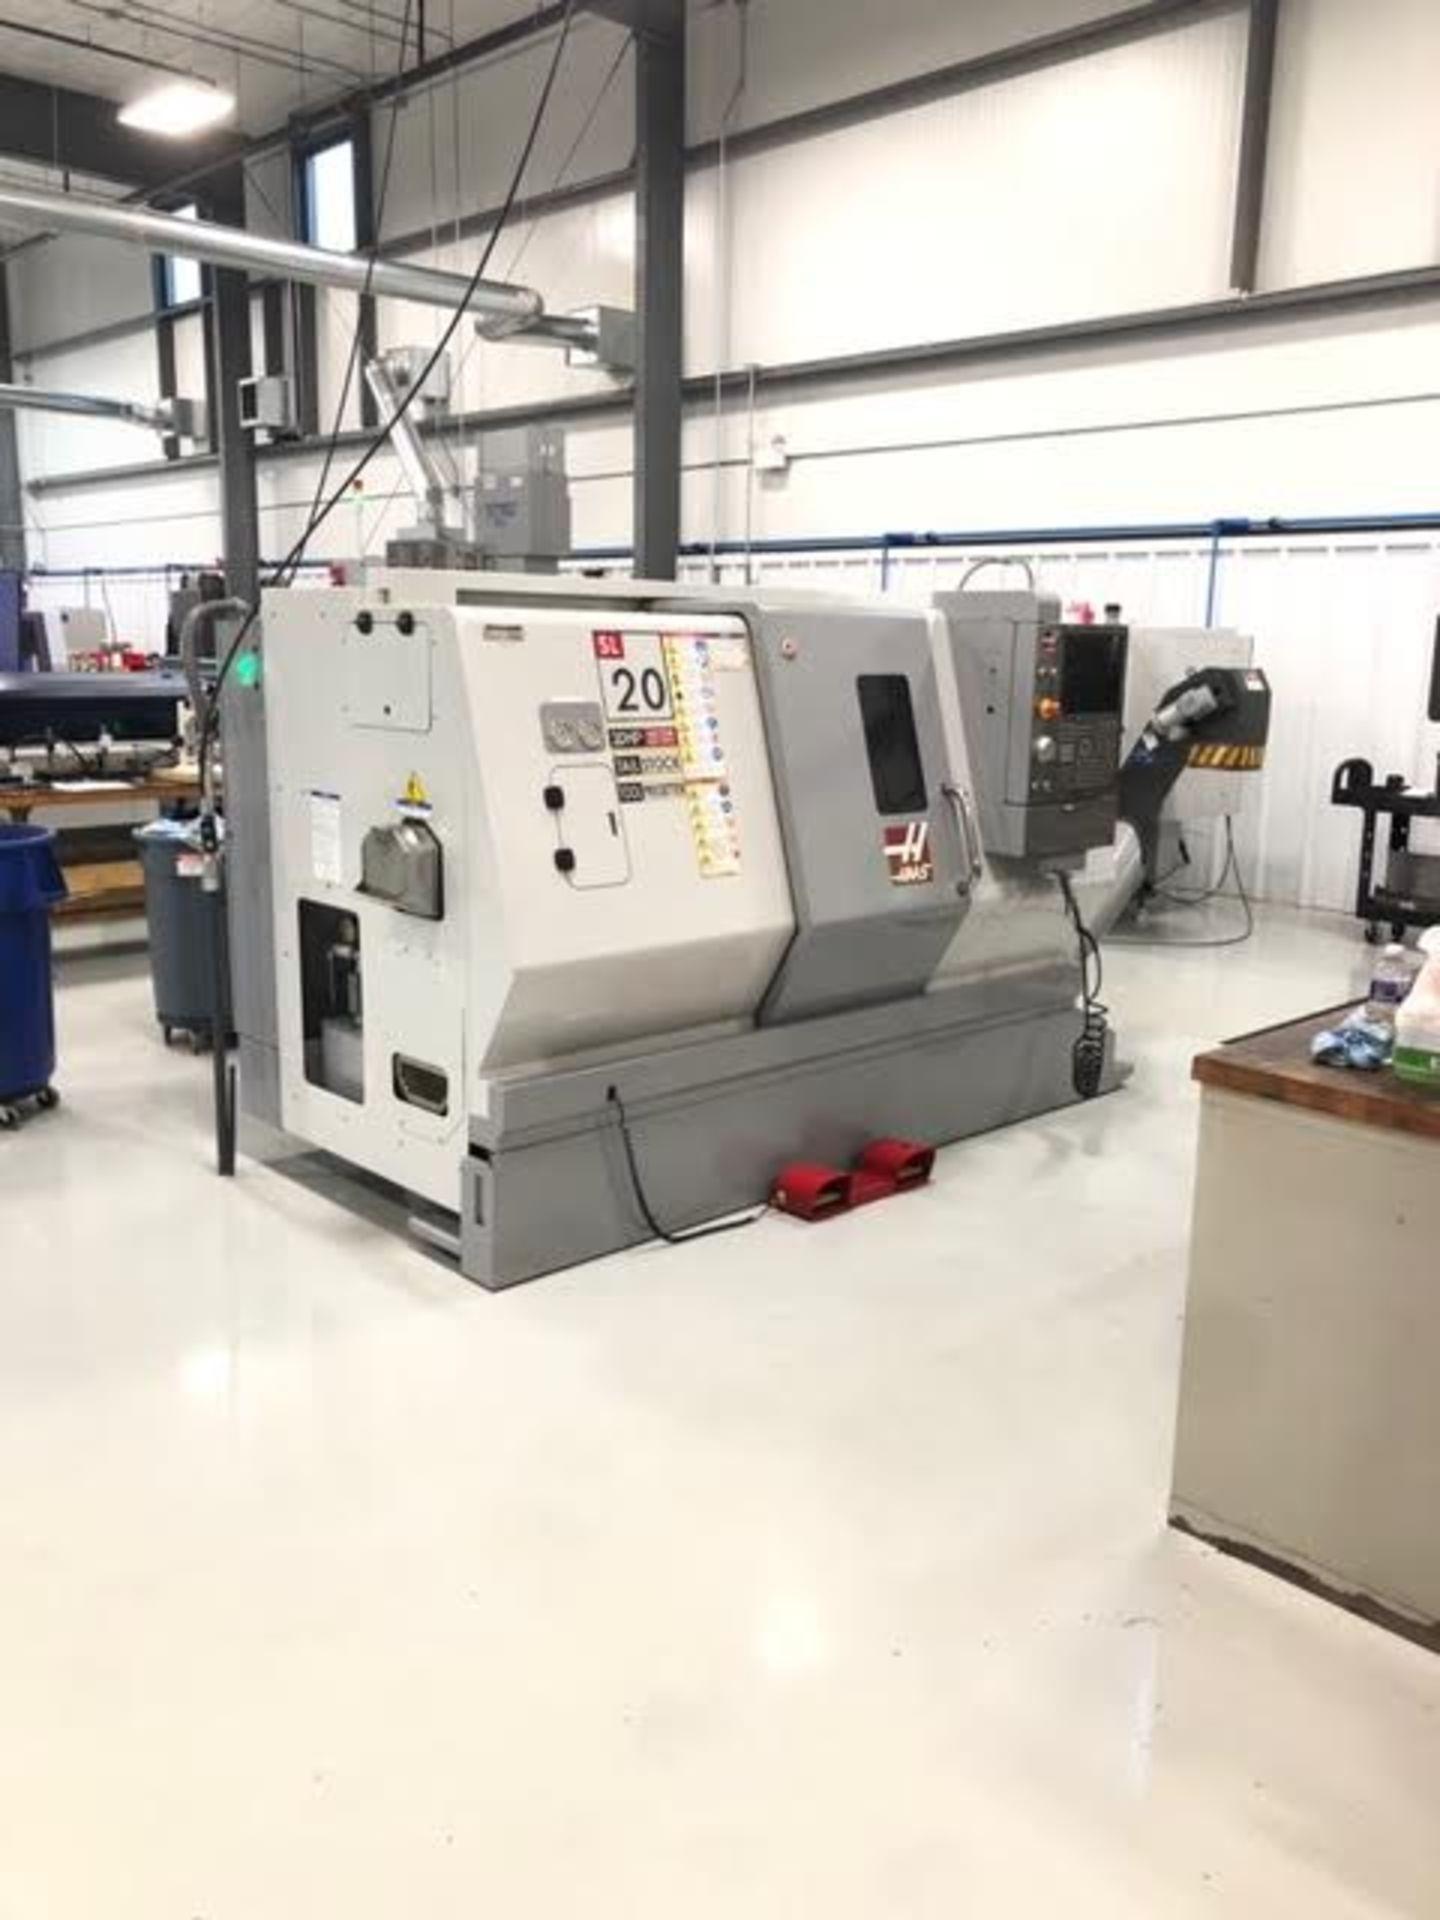 2009 Haas SL-20T CNC Lathe - Image 4 of 12